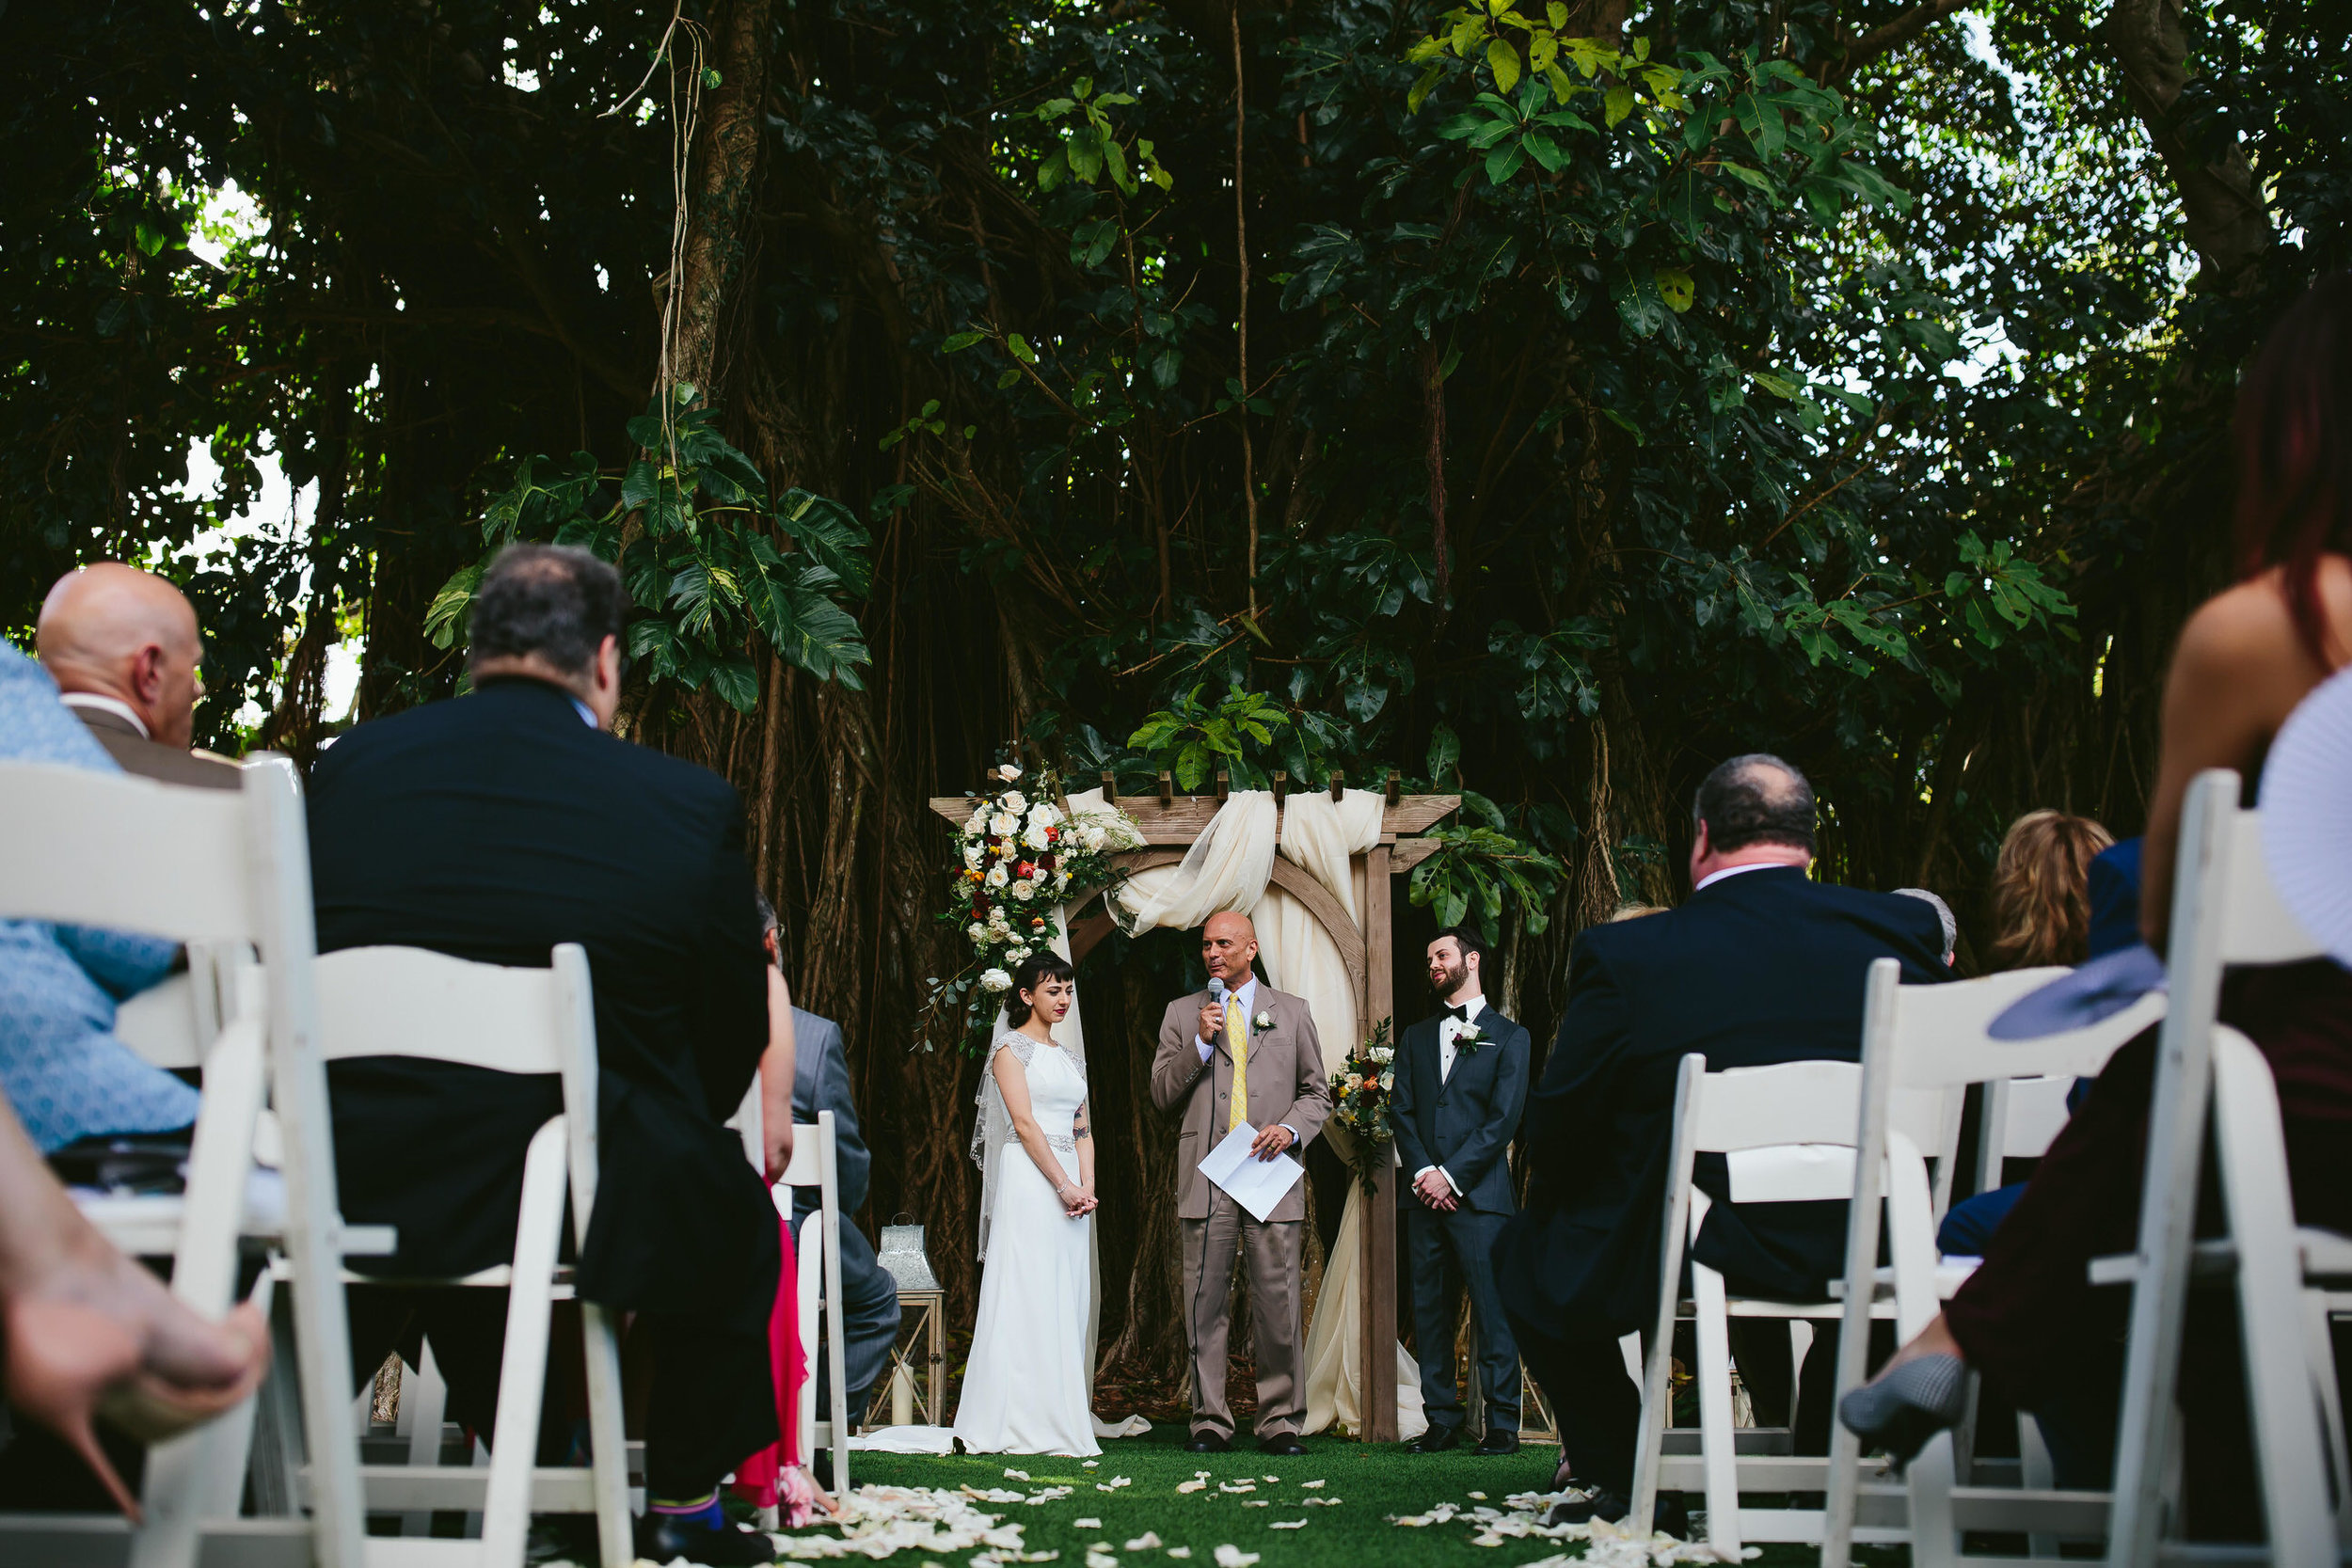 garden-wedding-tiny-house-photo-beautiful-moments-ceremony.jpg